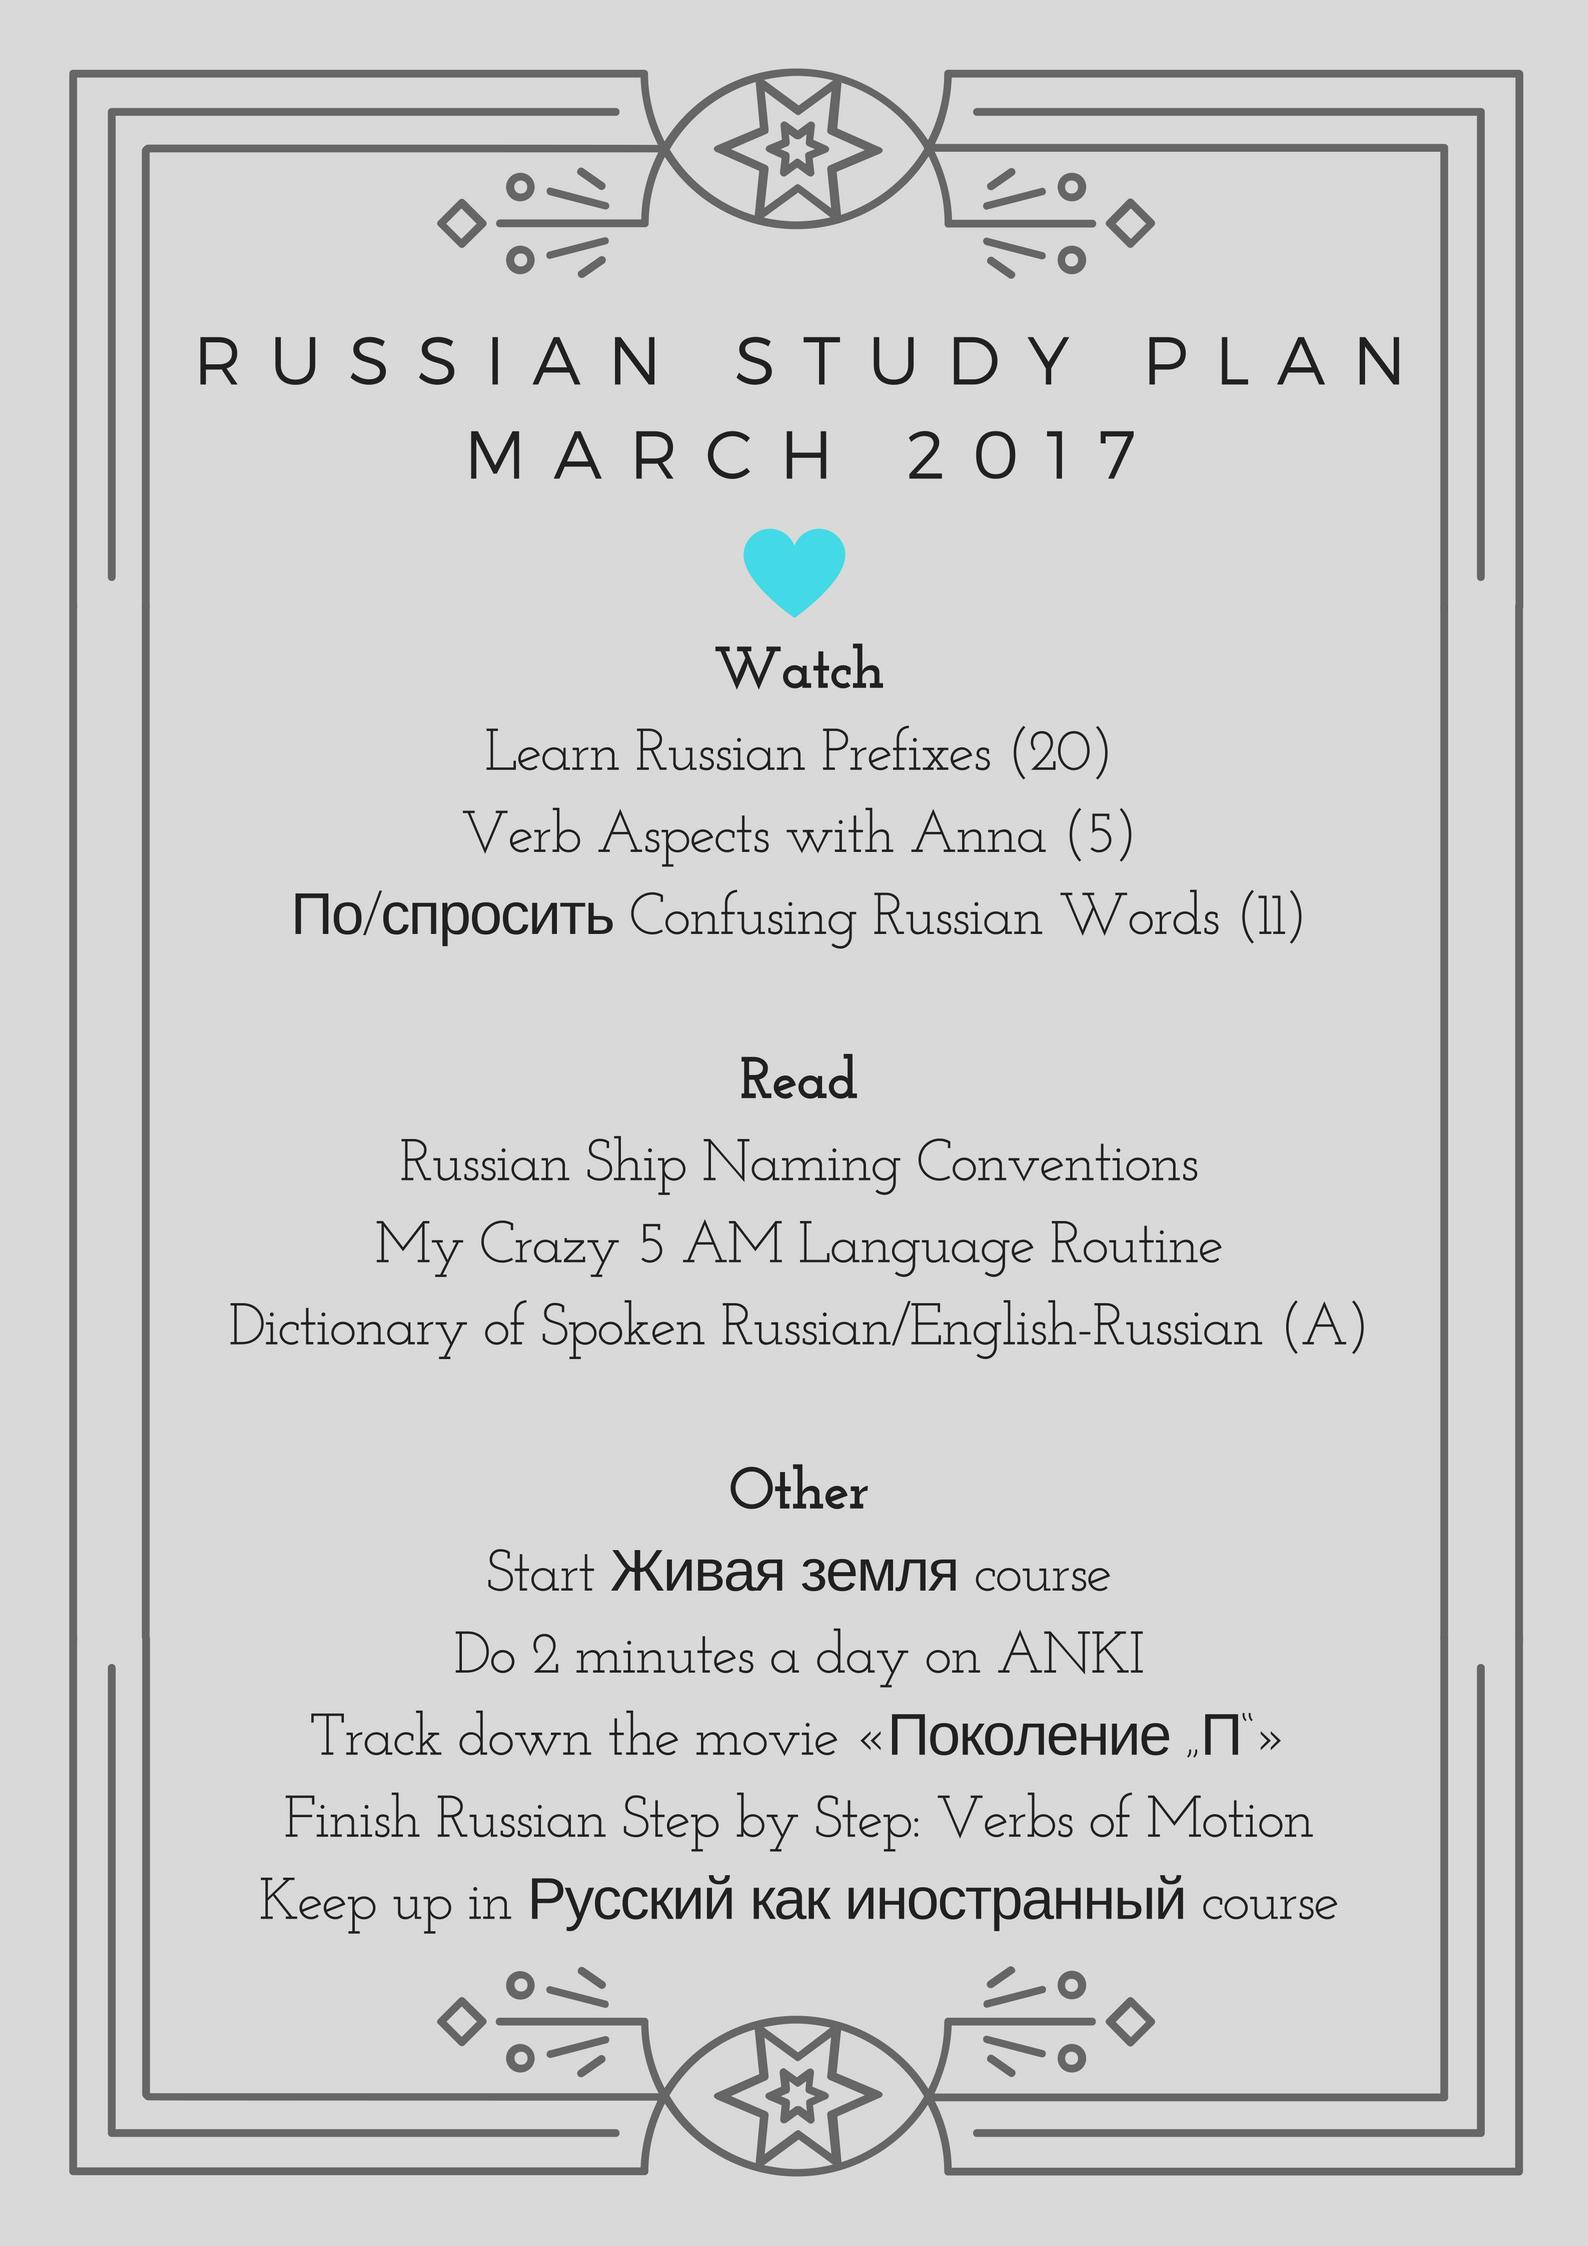 Russian Roundup- February 2017